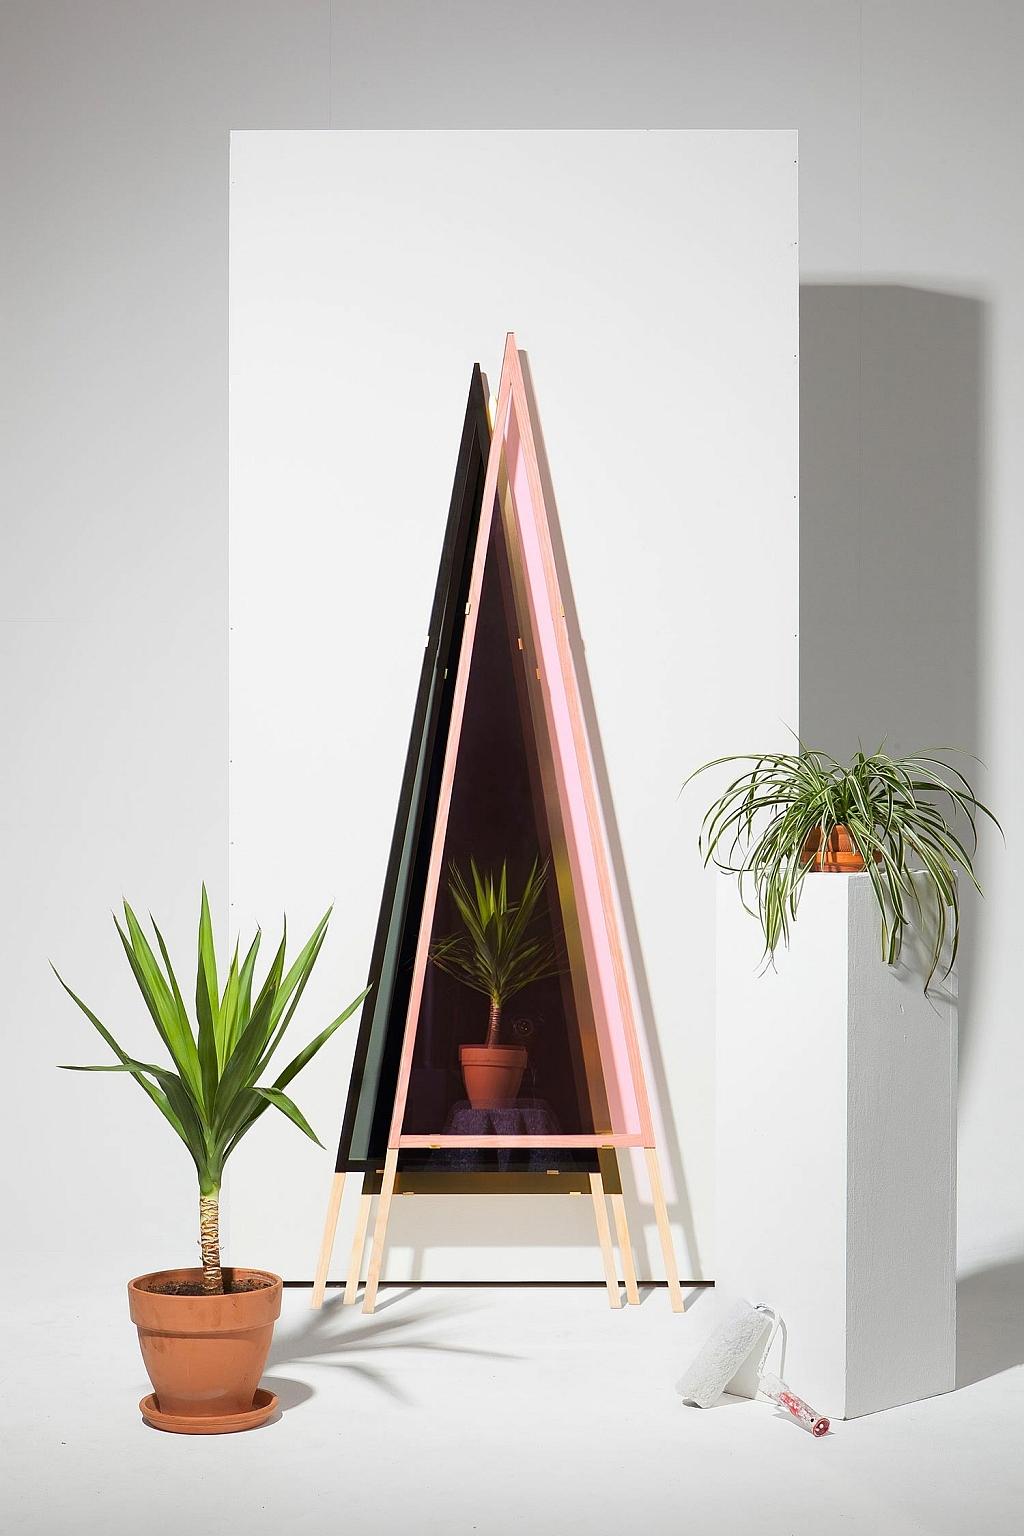 layered-glass-and-brass-123-mirror-1-1024x1536.jpg